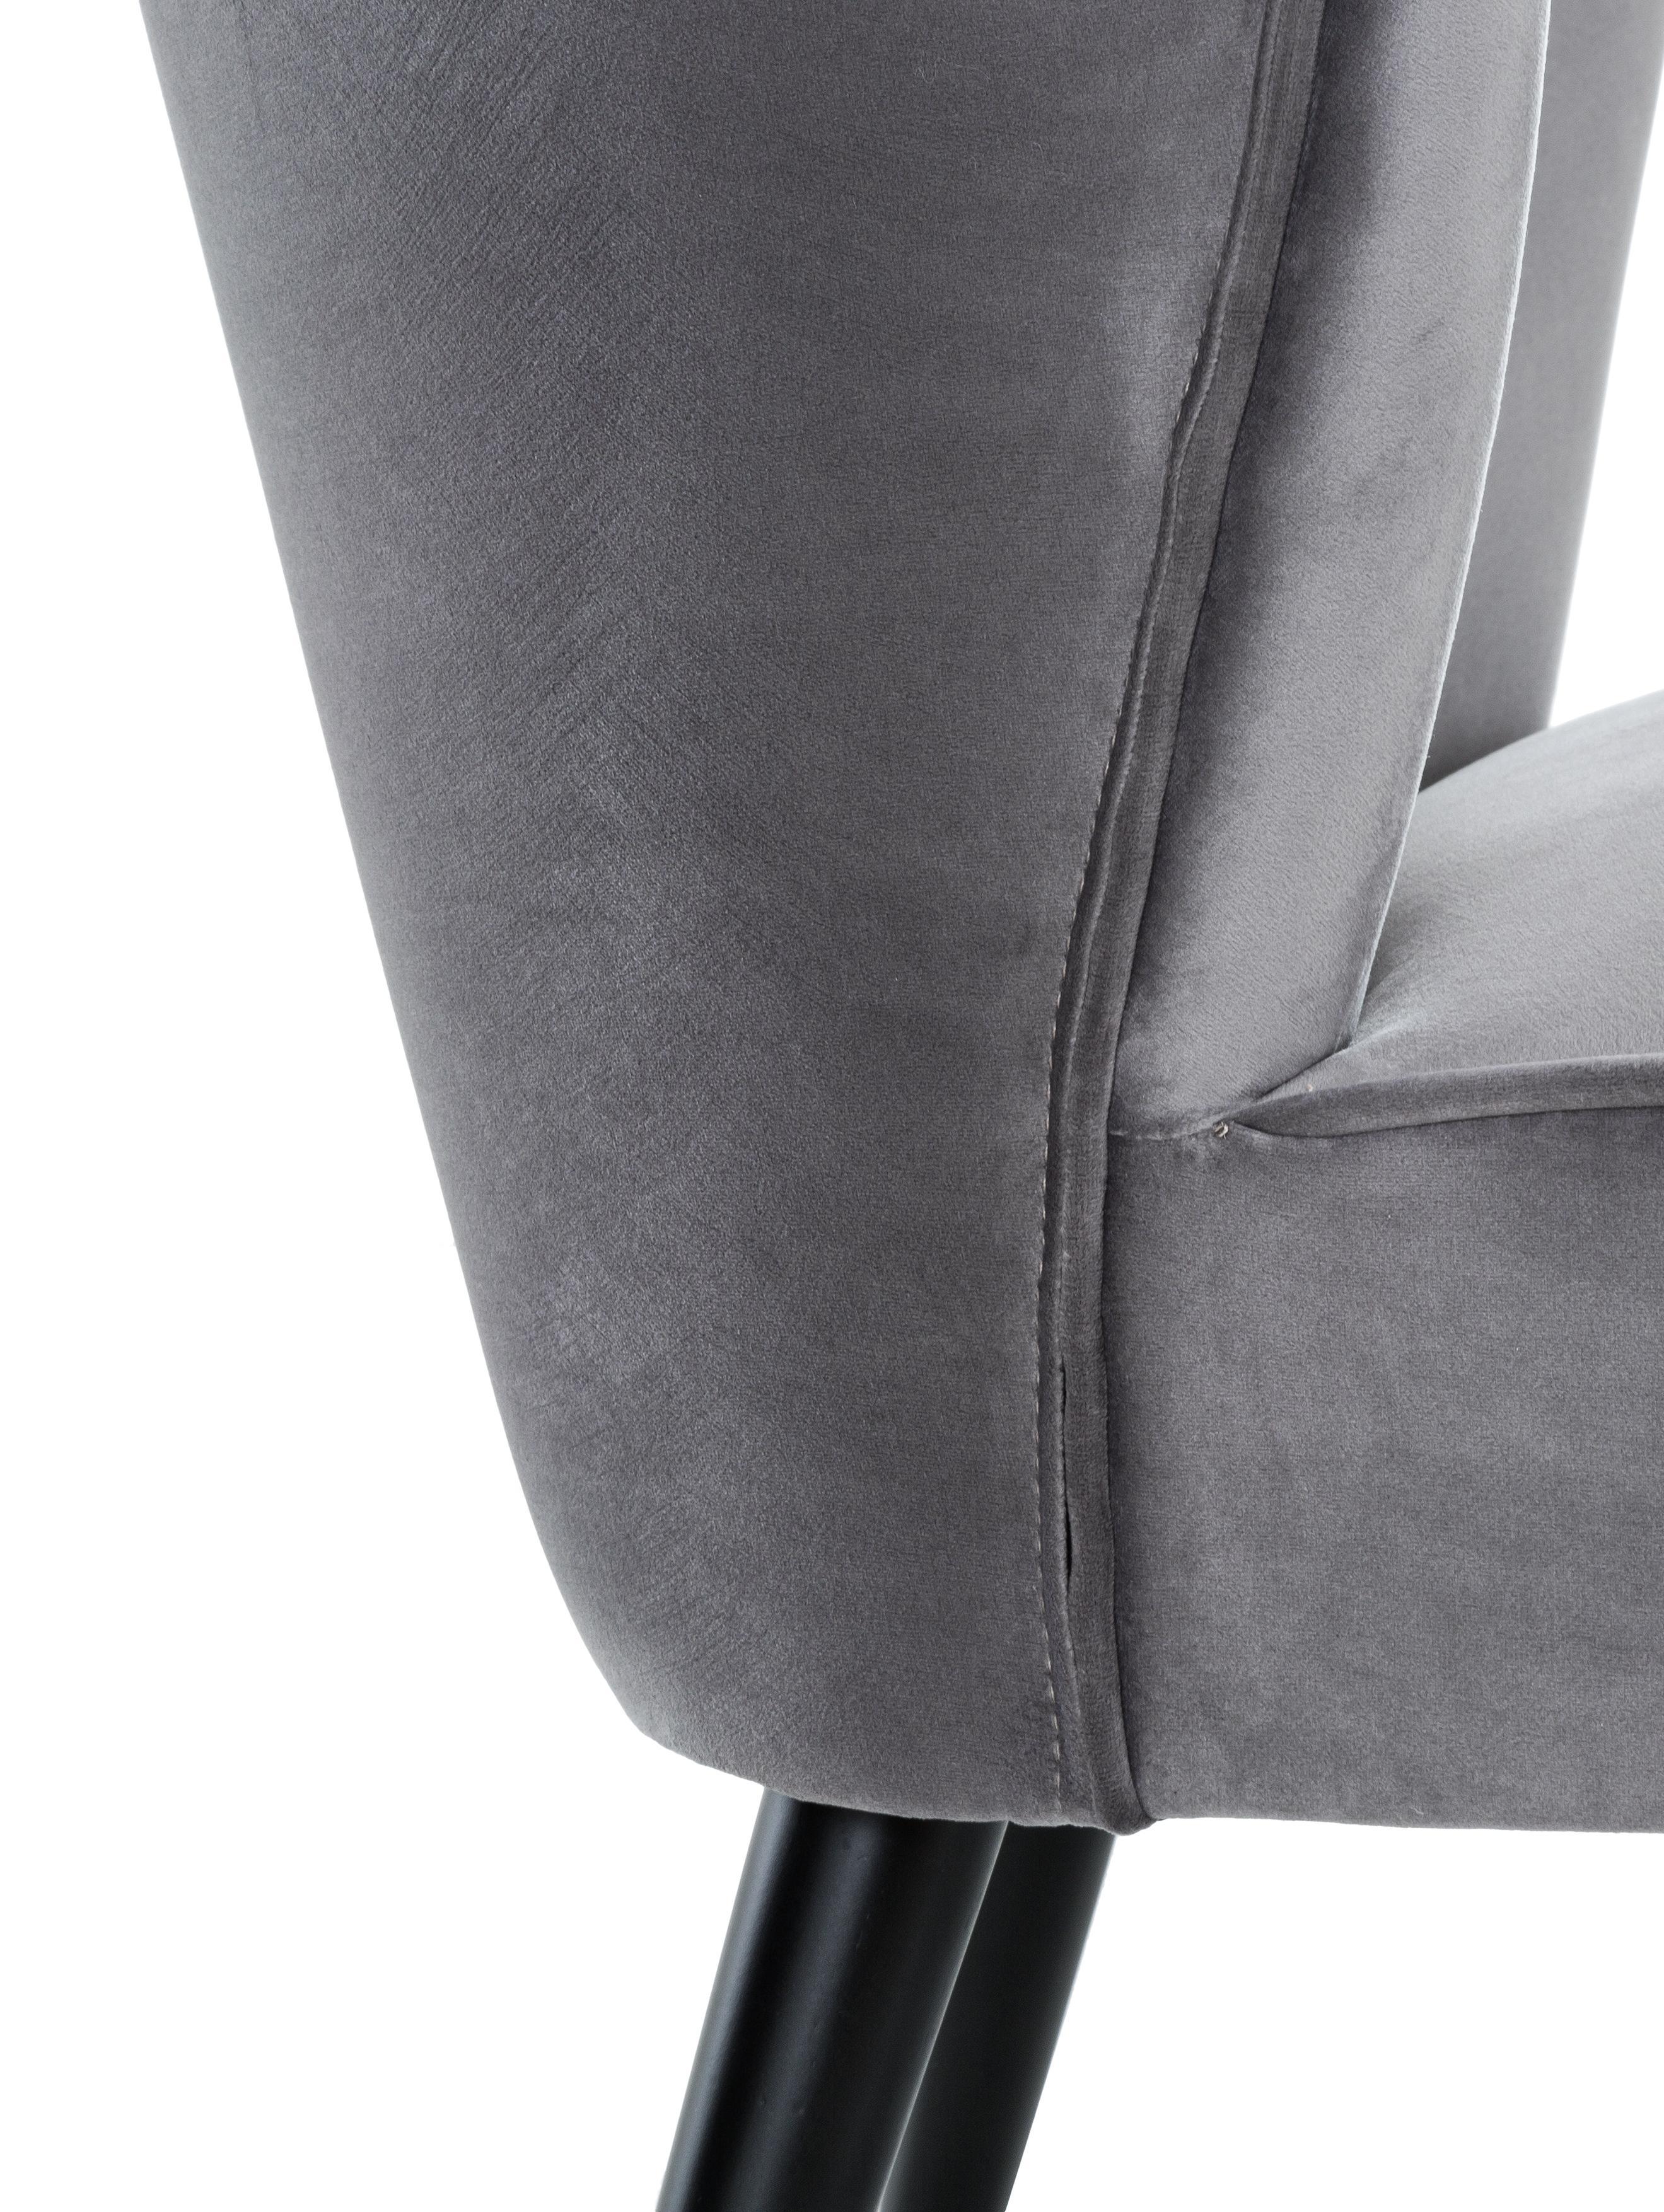 Samt-Cocktailsessel Robine in Grau, Bezug: Samt (Polyester) 30.000 S, Füße: Kiefernholz, lackiert, Samt Grau, B 63 x T 73 cm